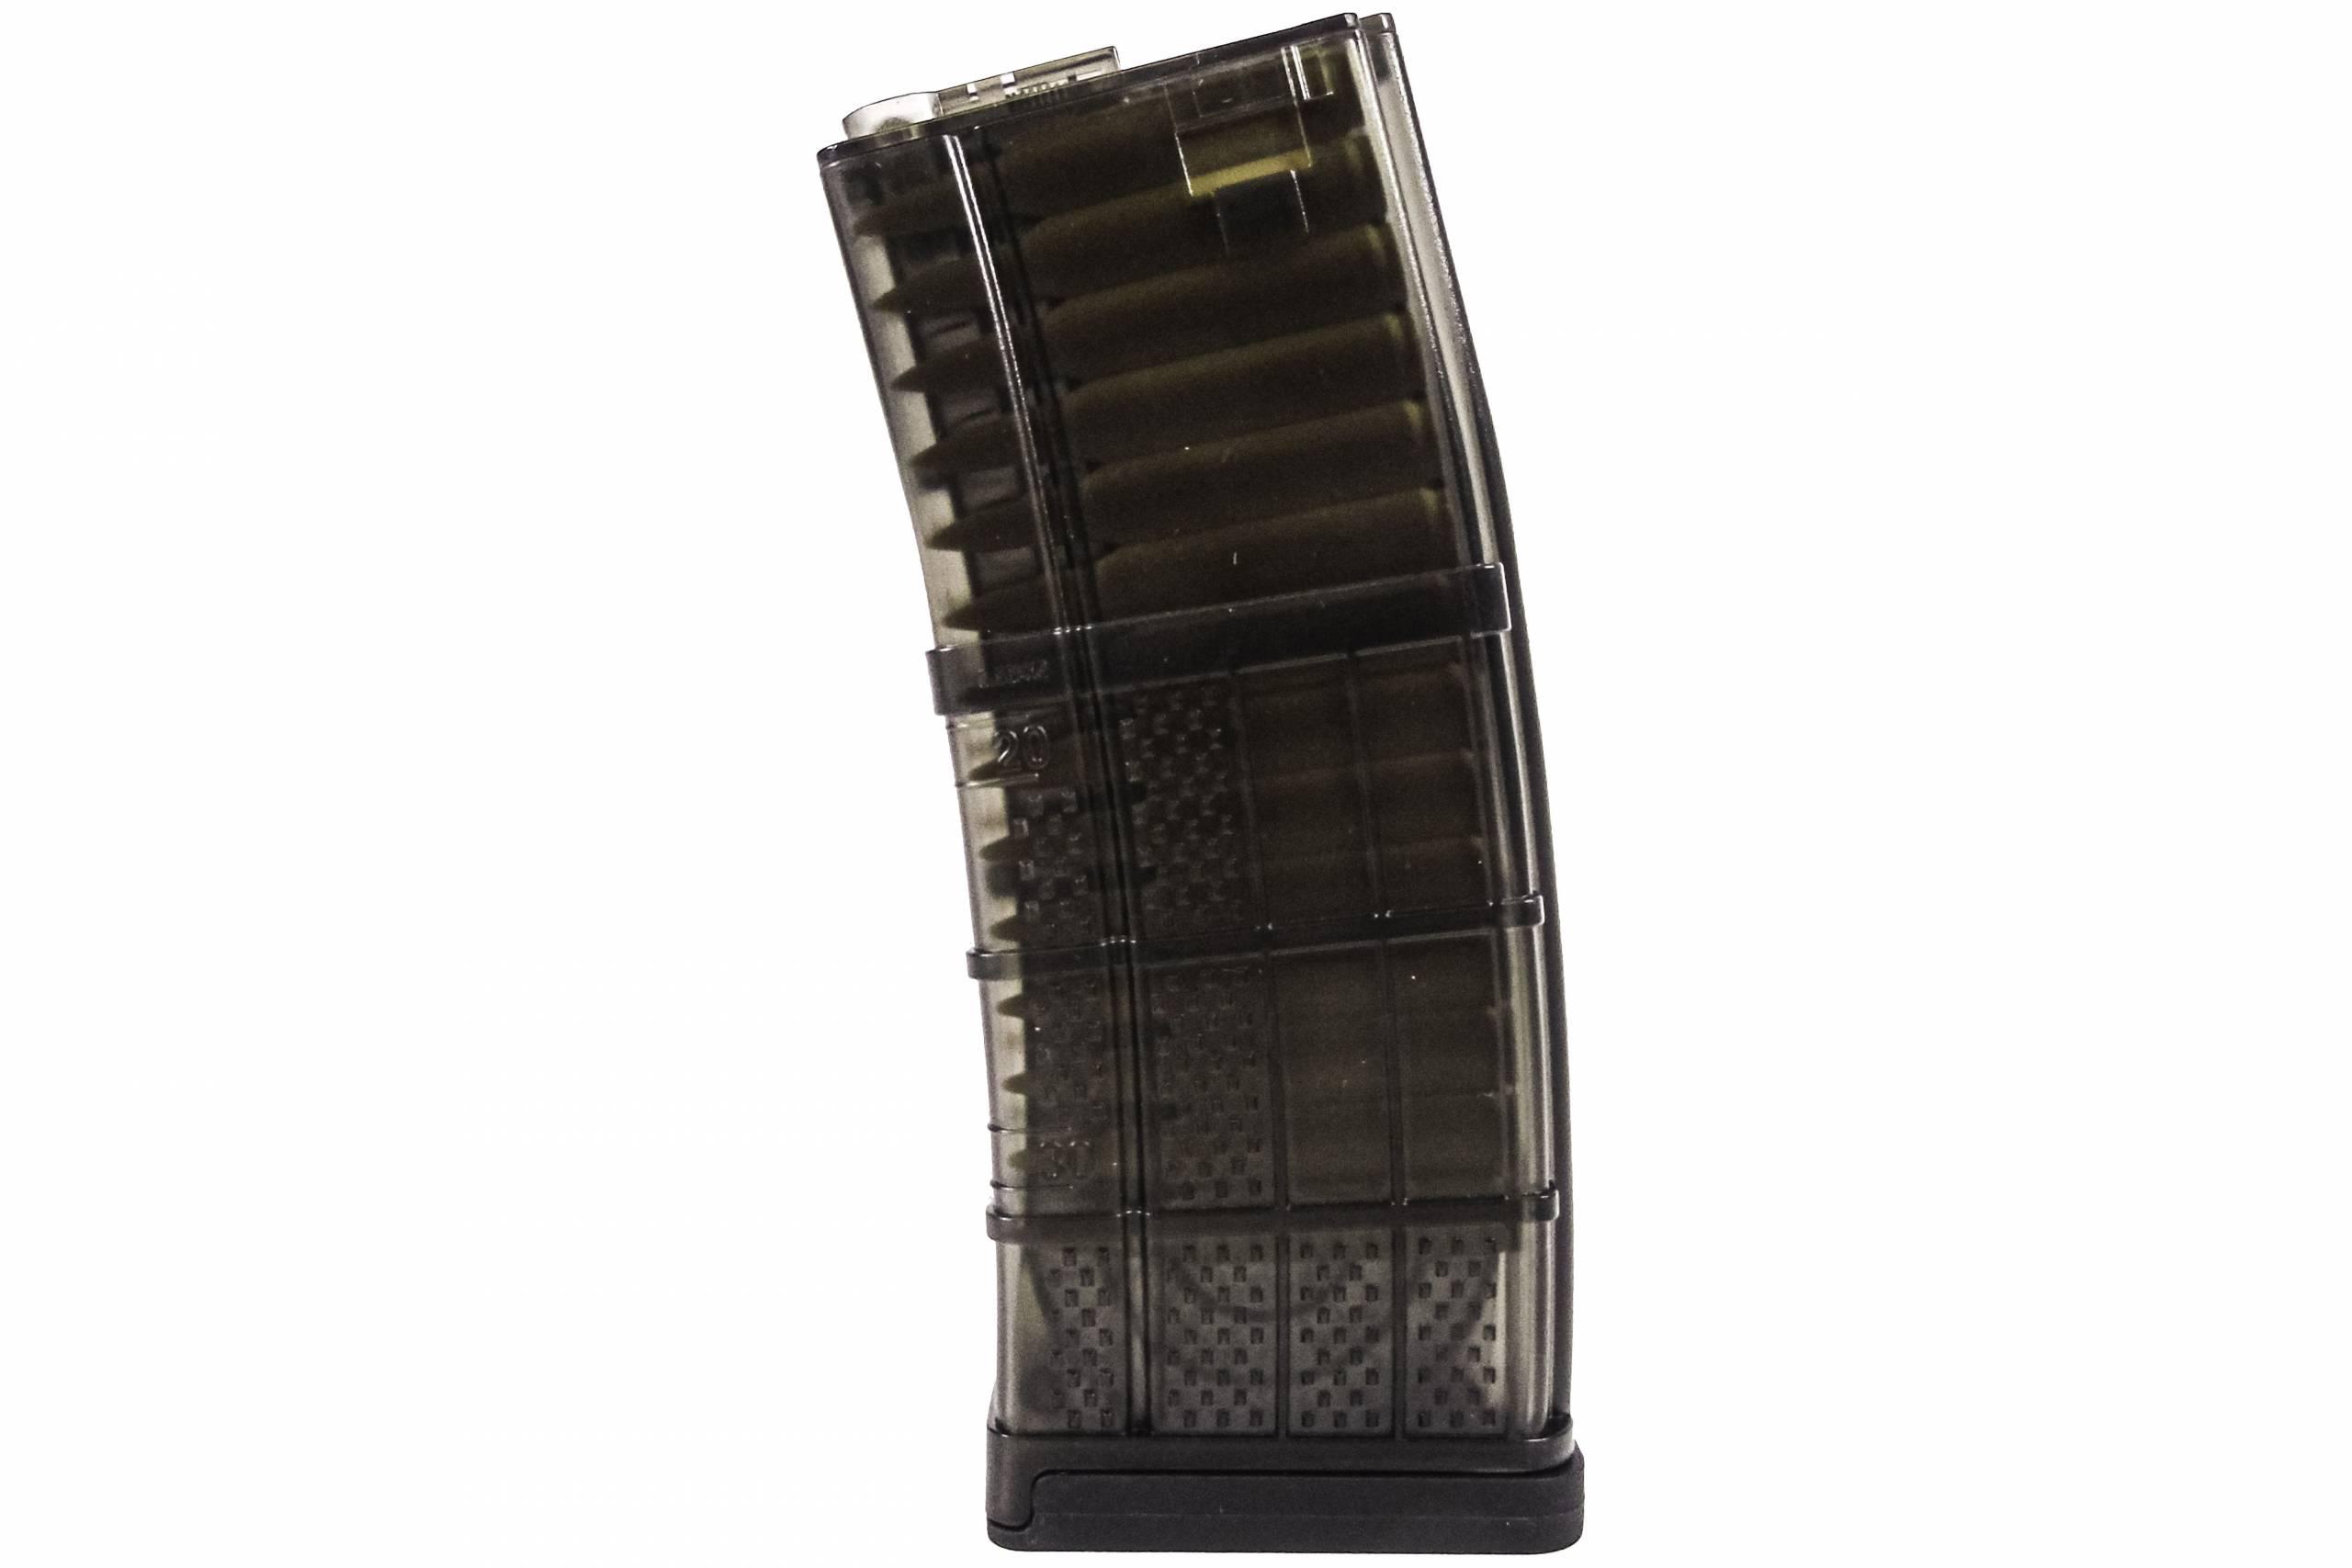 NUPROL L-MAG MID-CAP MAG 130RND – CLEAR product image